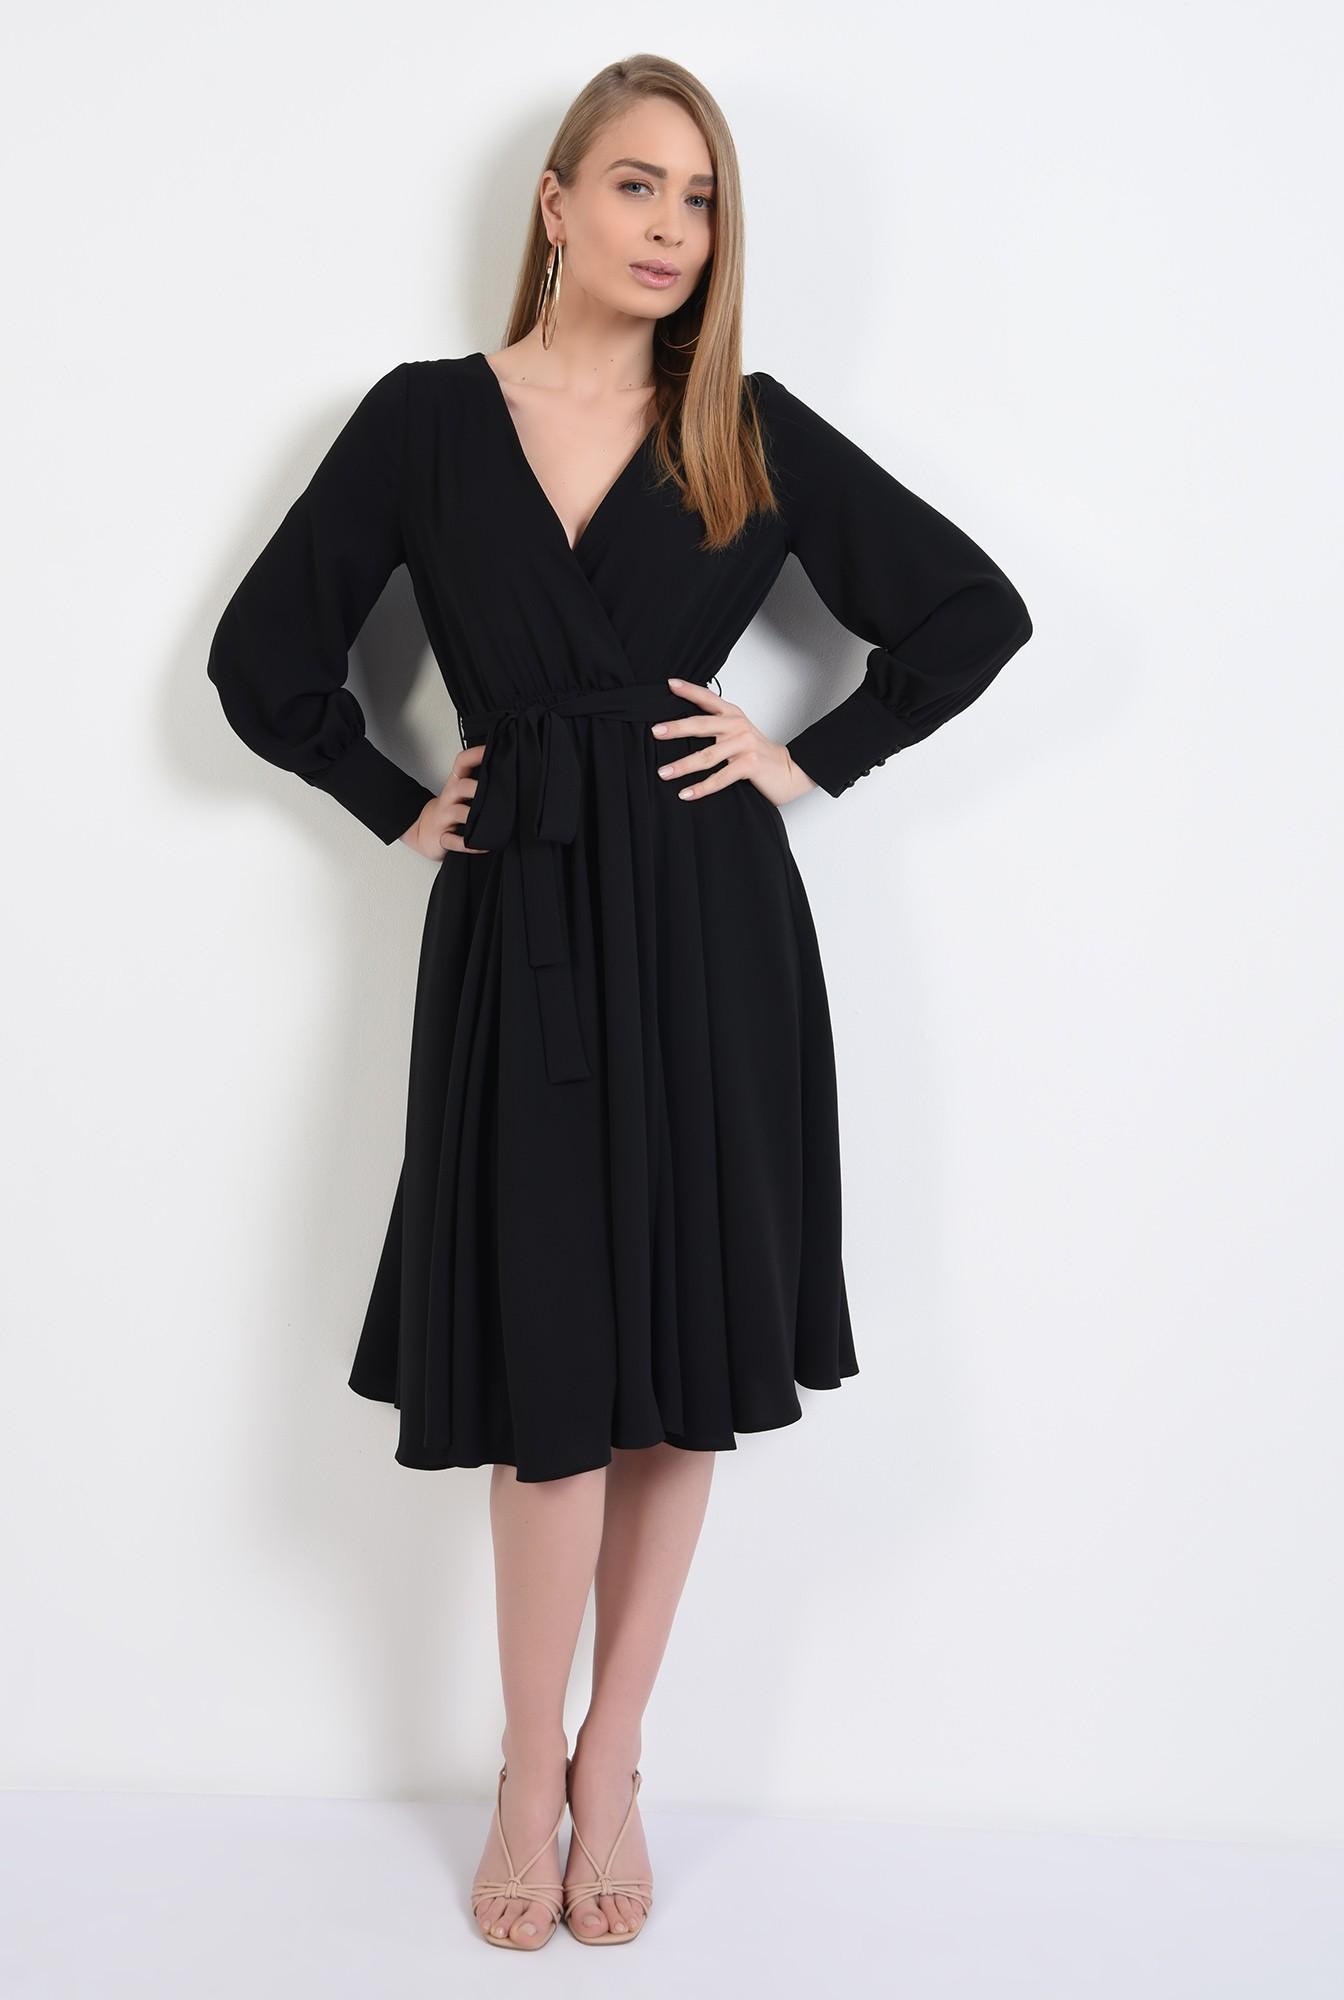 3 - rochie neagra, cu anchior petrecut, midi, evazata, cu cordon, rochie de primavara